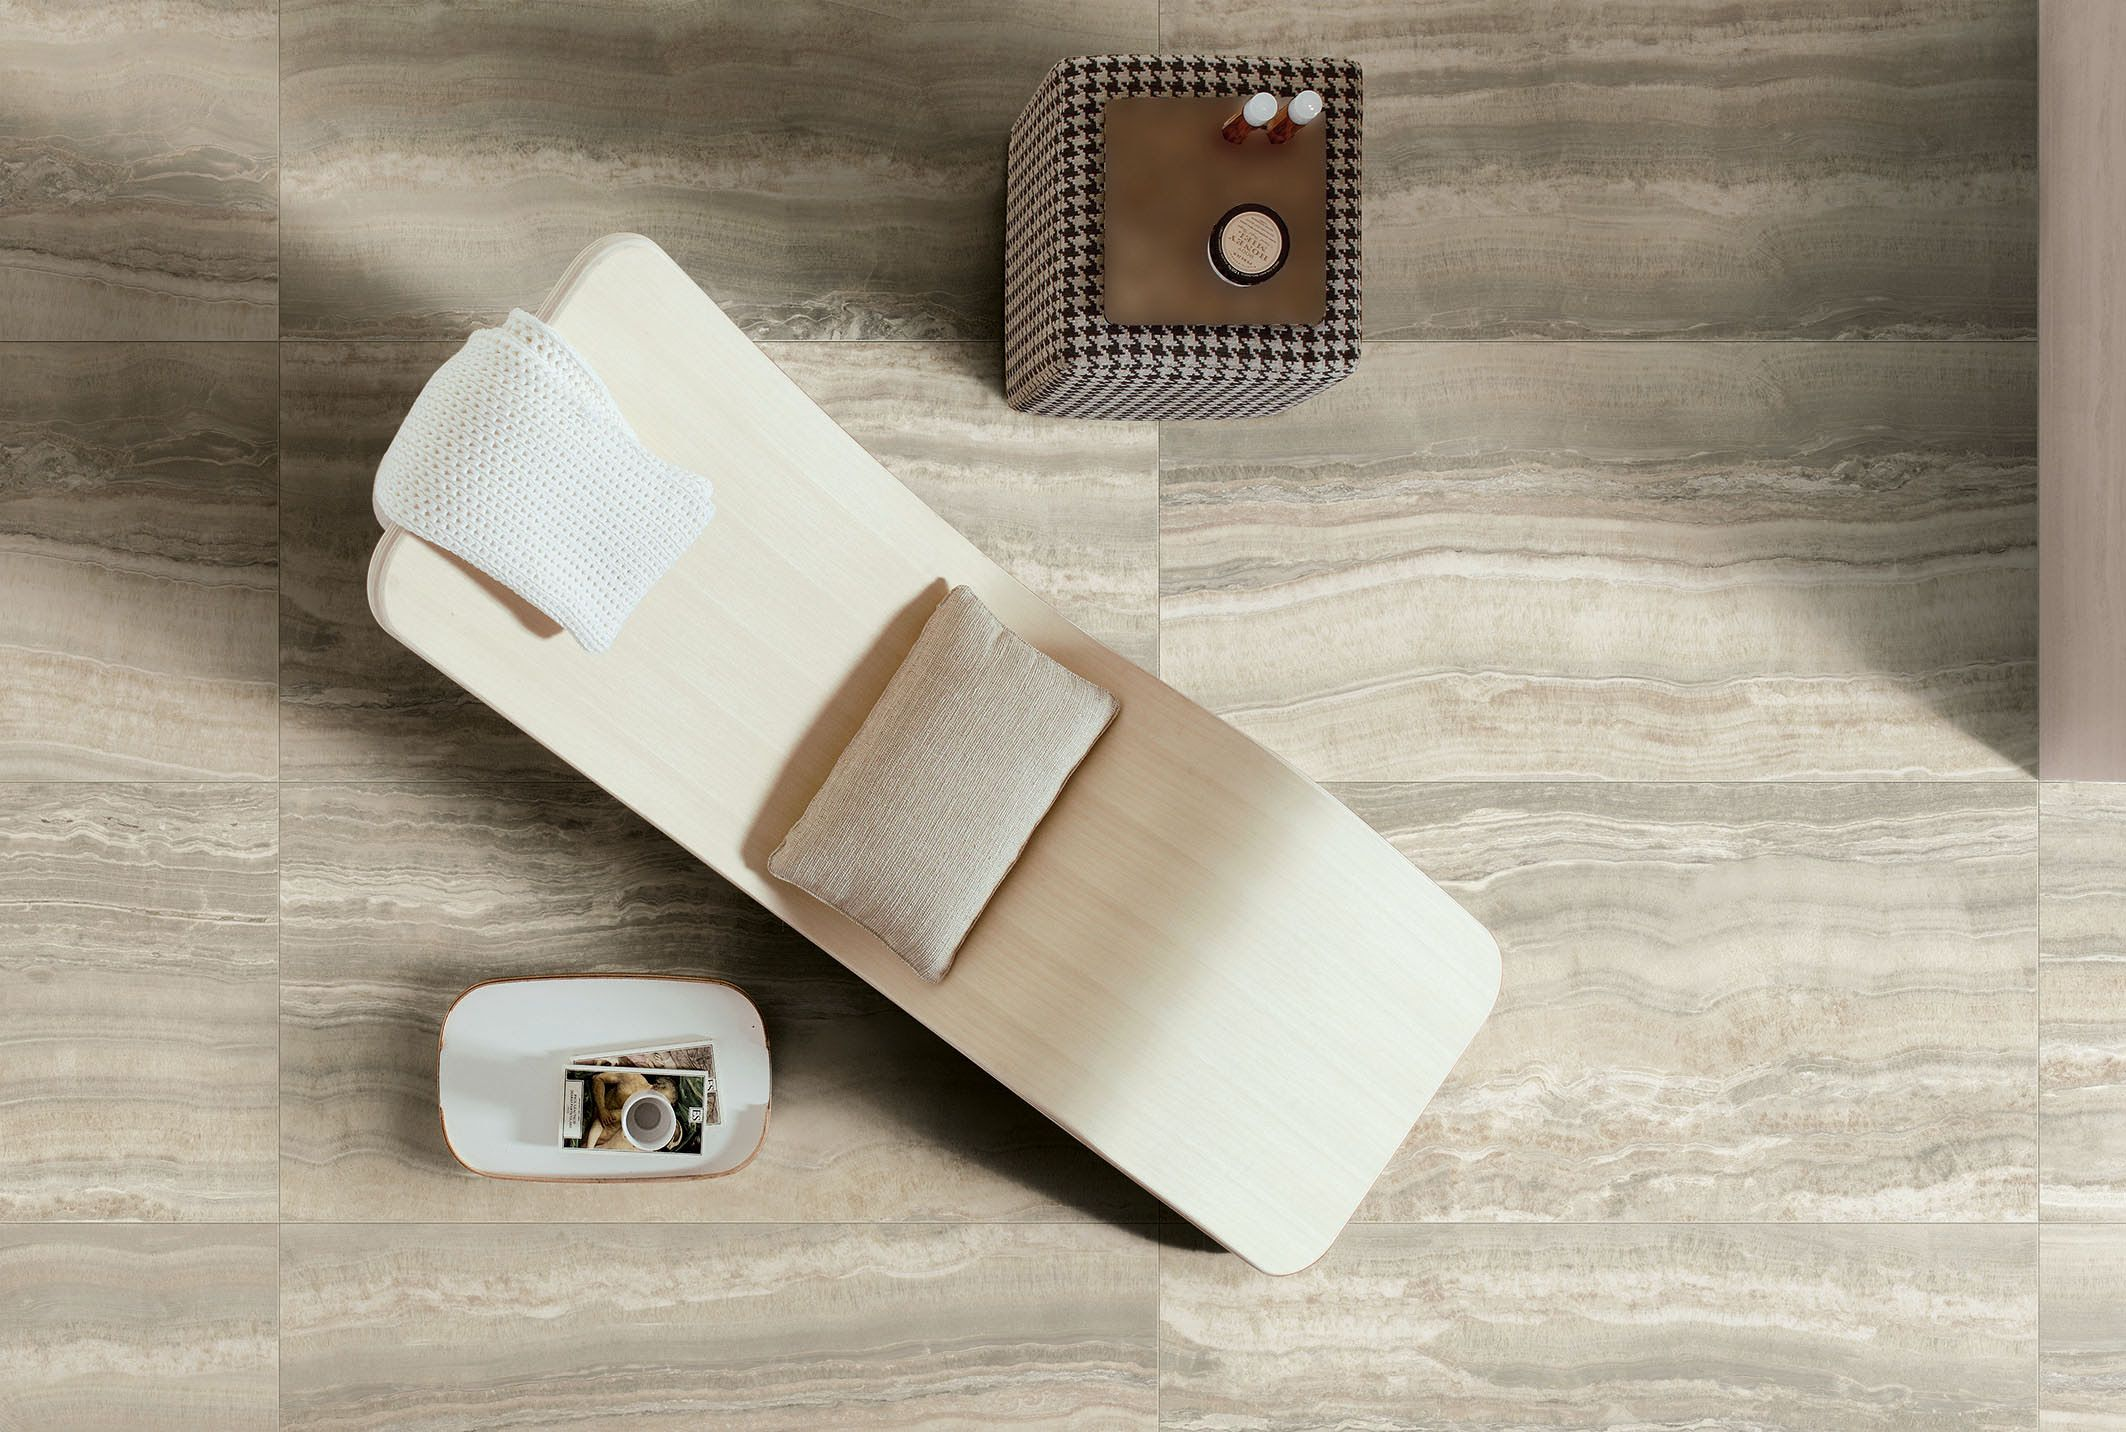 Neutral large format rustic porcelain tile